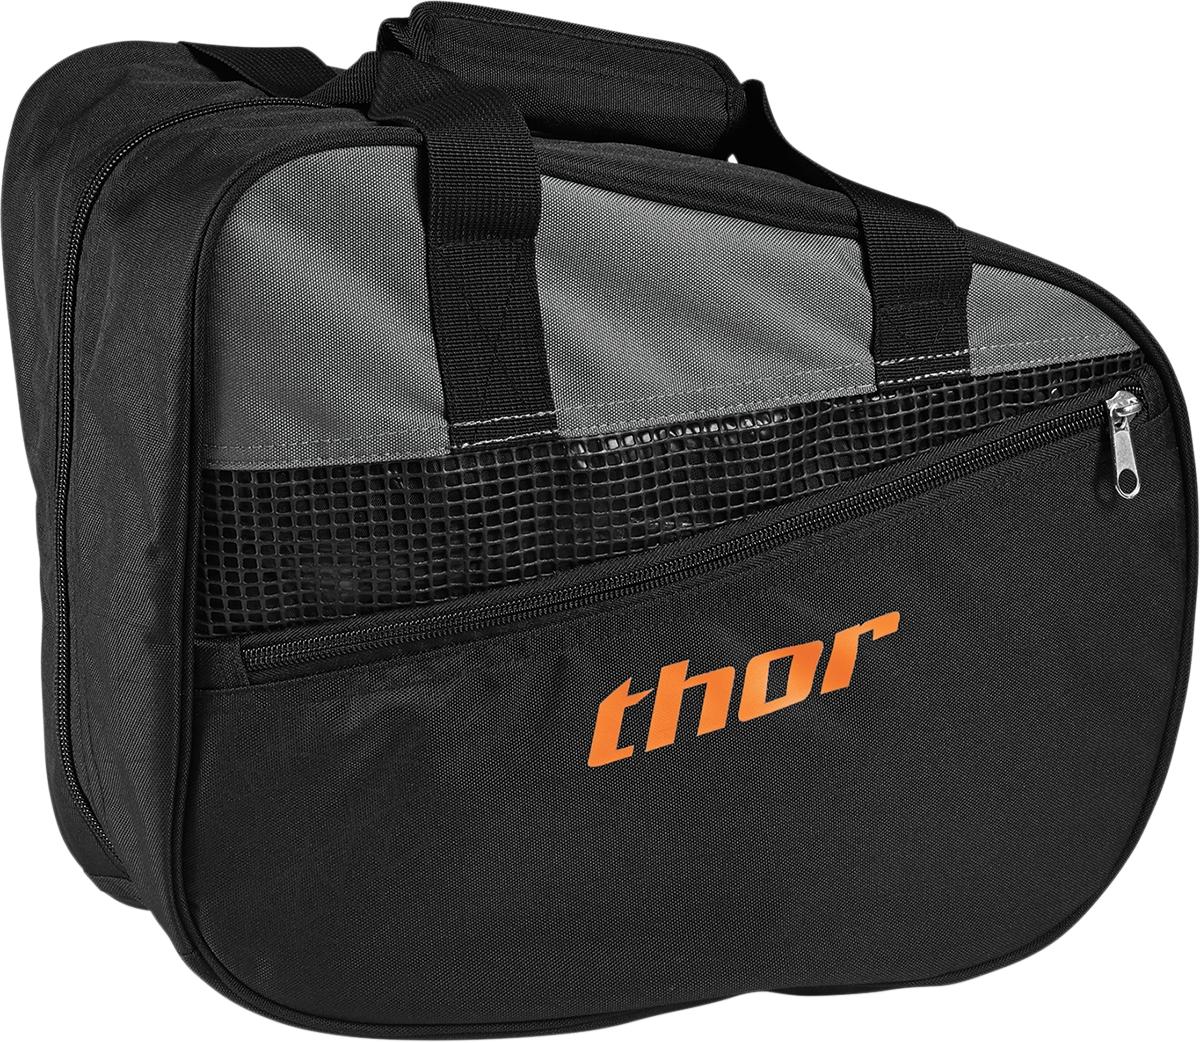 Thor S6 Rival Helmet Bag